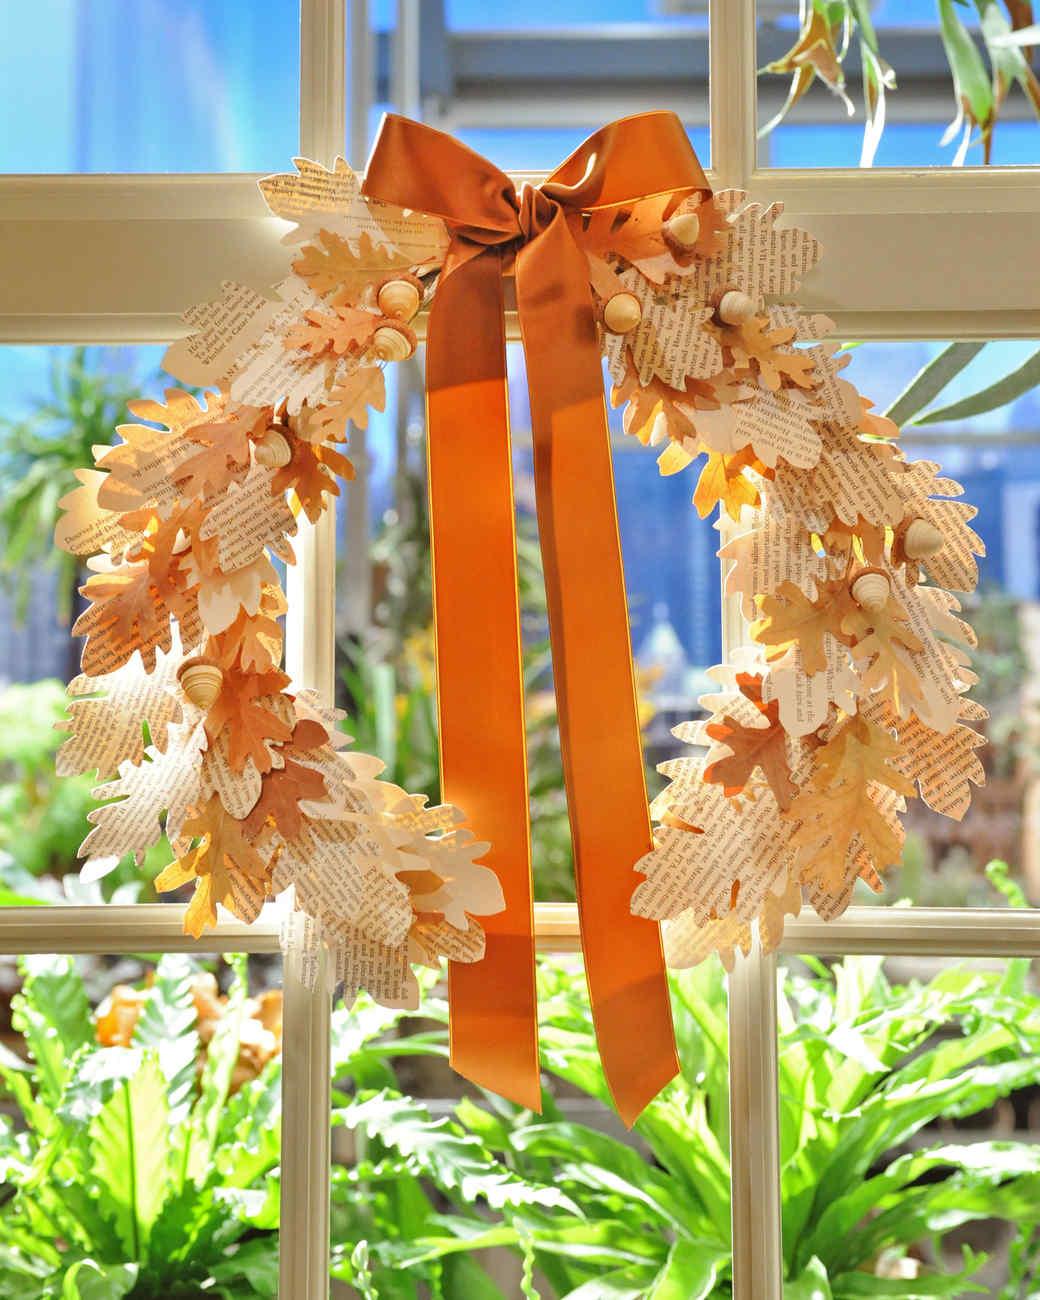 6001_6050/6011_092310_wreath.jpg